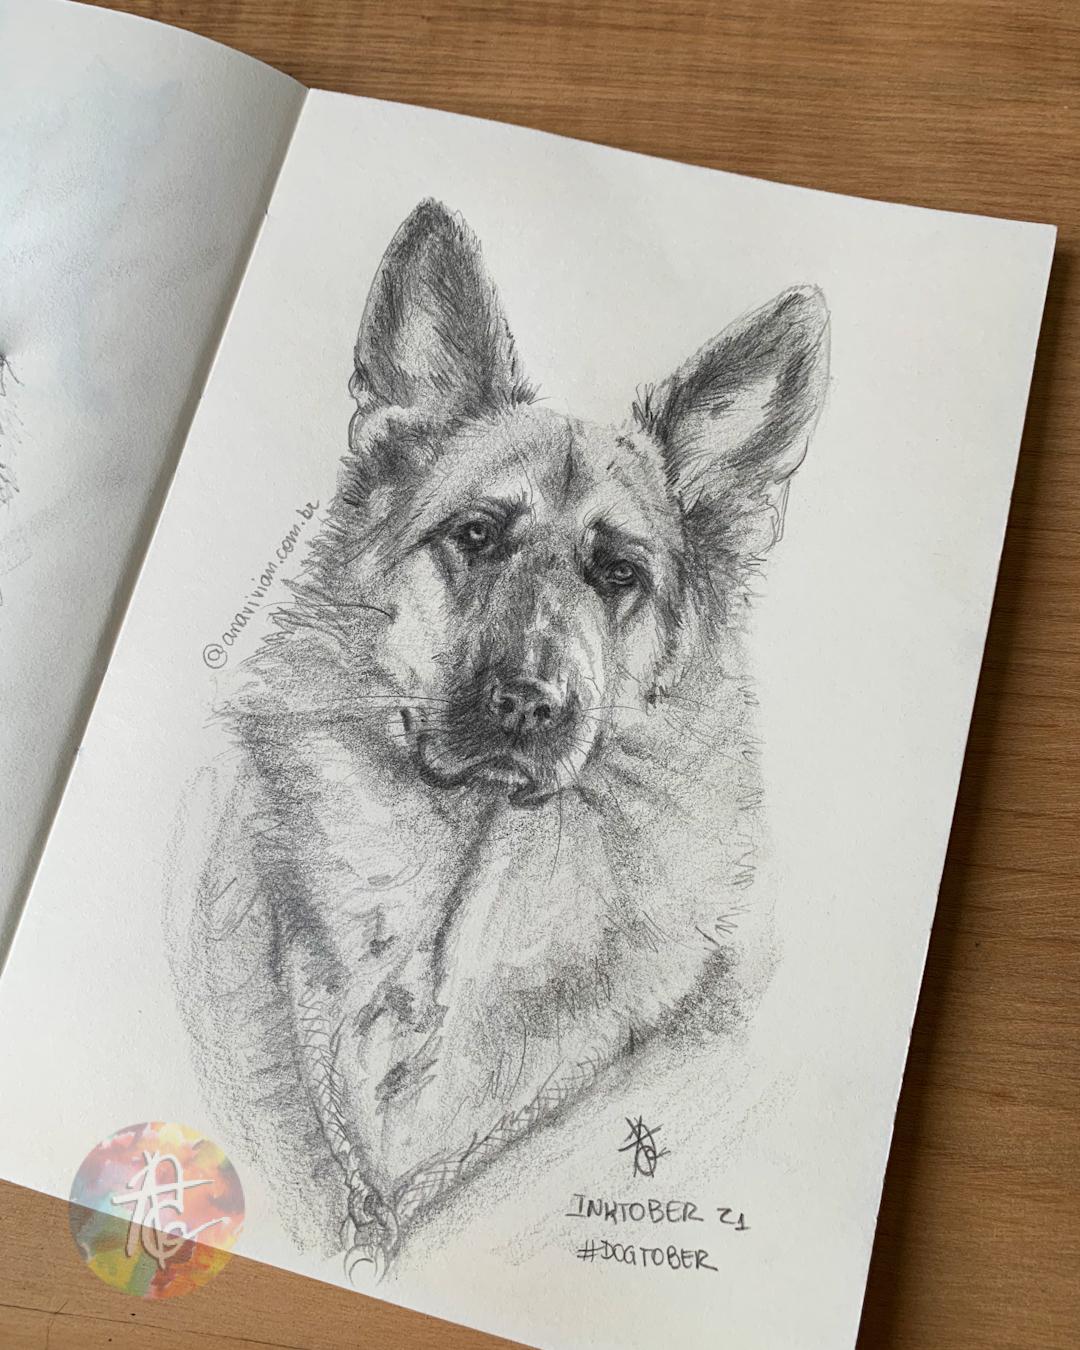 Desafio de desenho: Inktober/Dogtober 2021